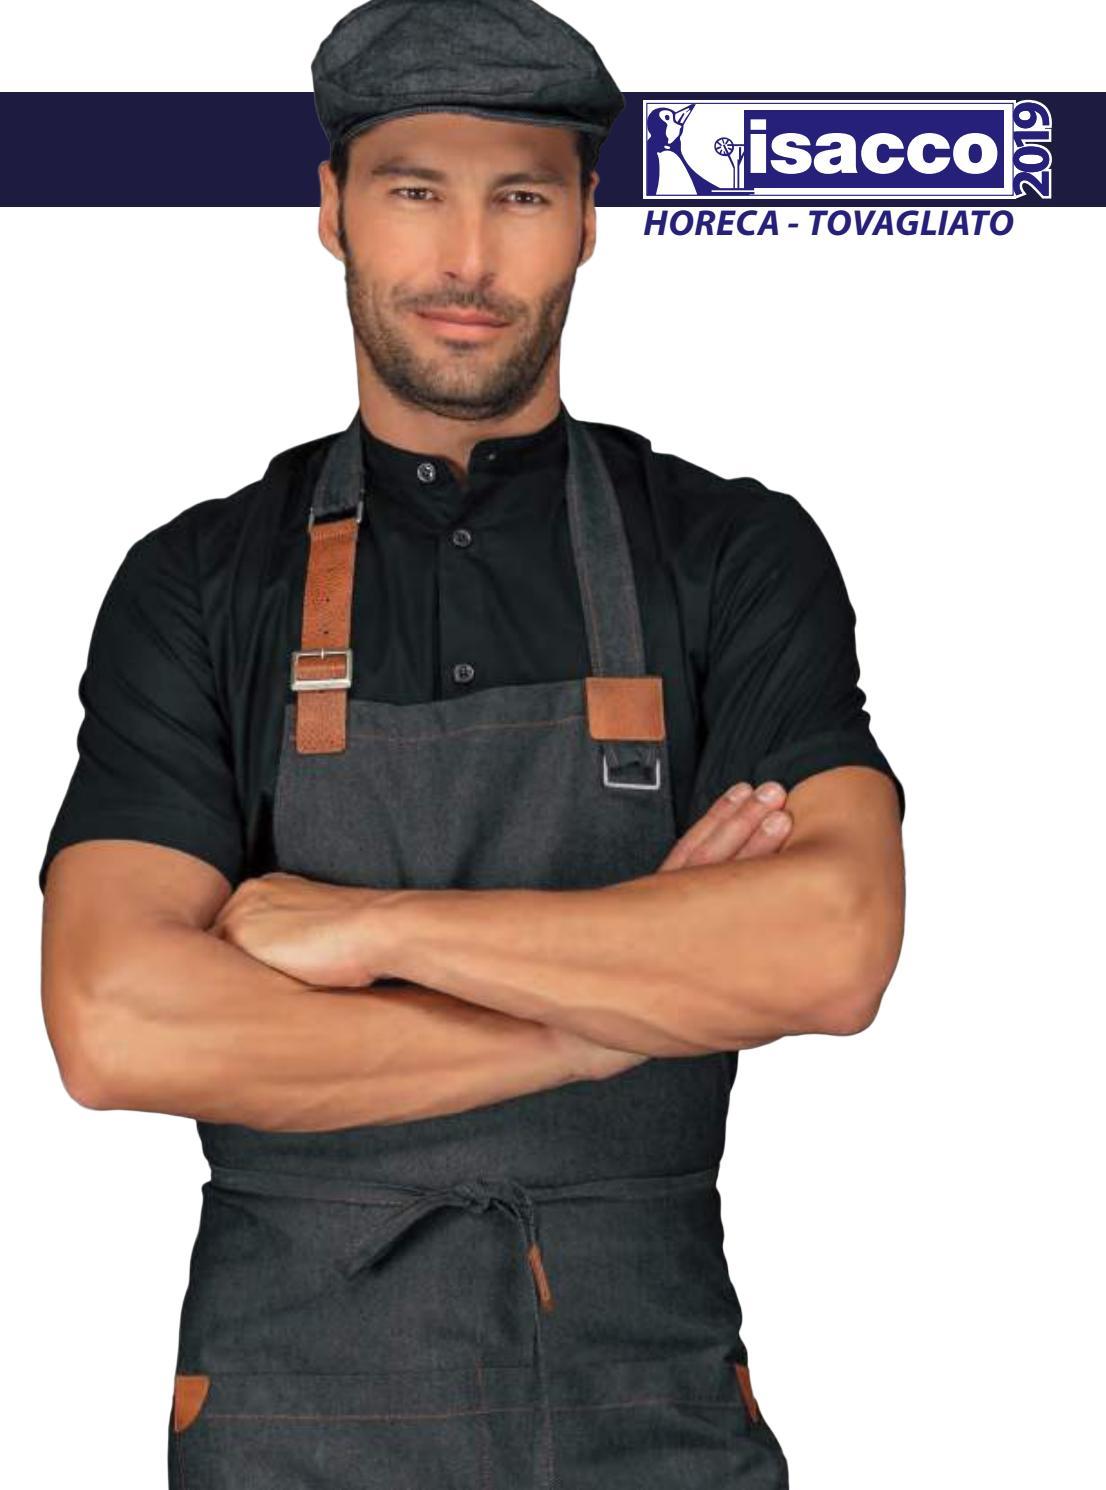 210 gr//m/² 97/% Cotone 3/% Spandex Manica Lunga Isacco Giacca Lady Chef Bianco S Bianco